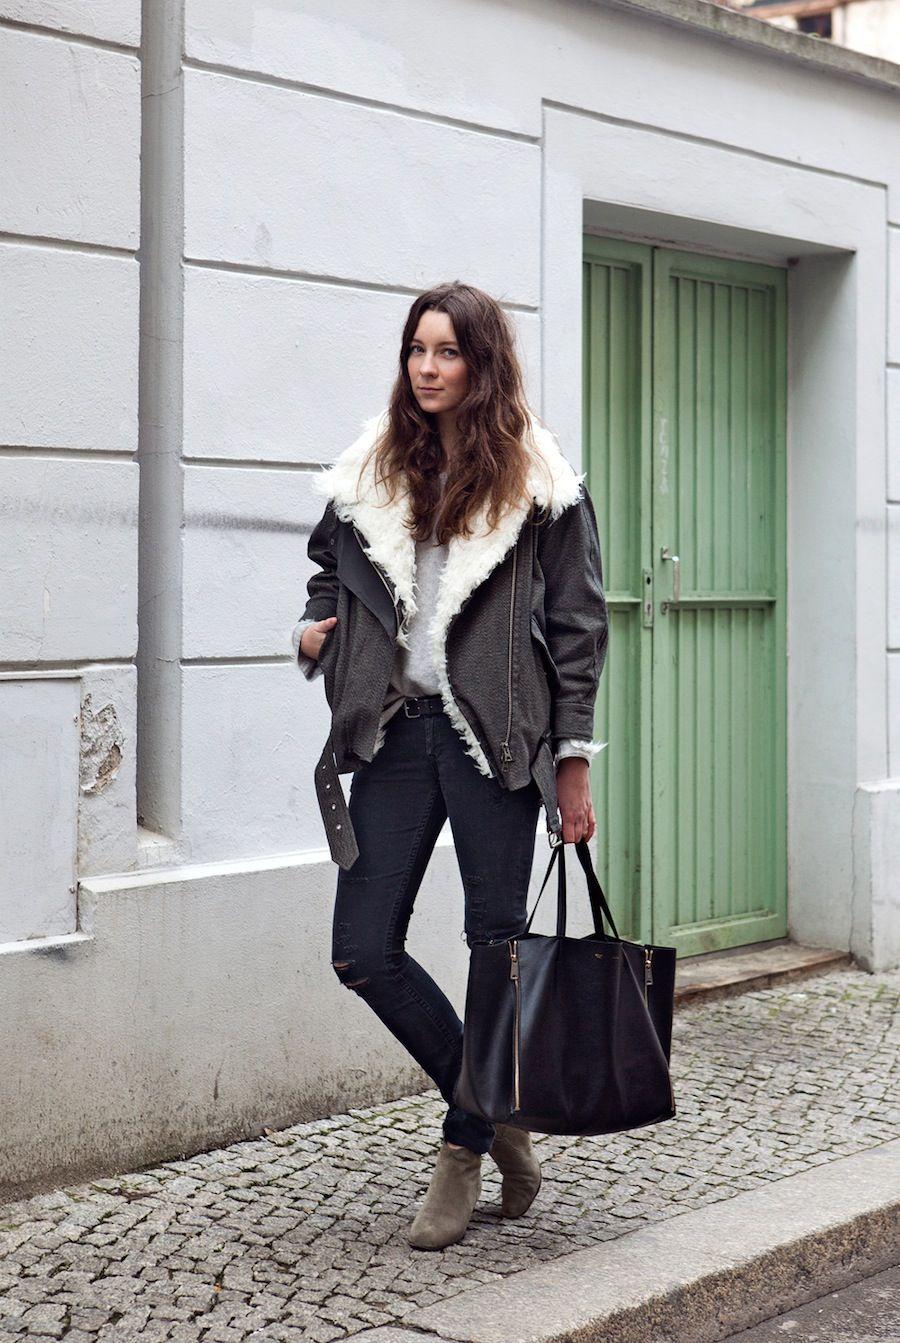 Isabel Marant Jacket // Isabel Marant Dicker Boots // Céline Cabas Bag